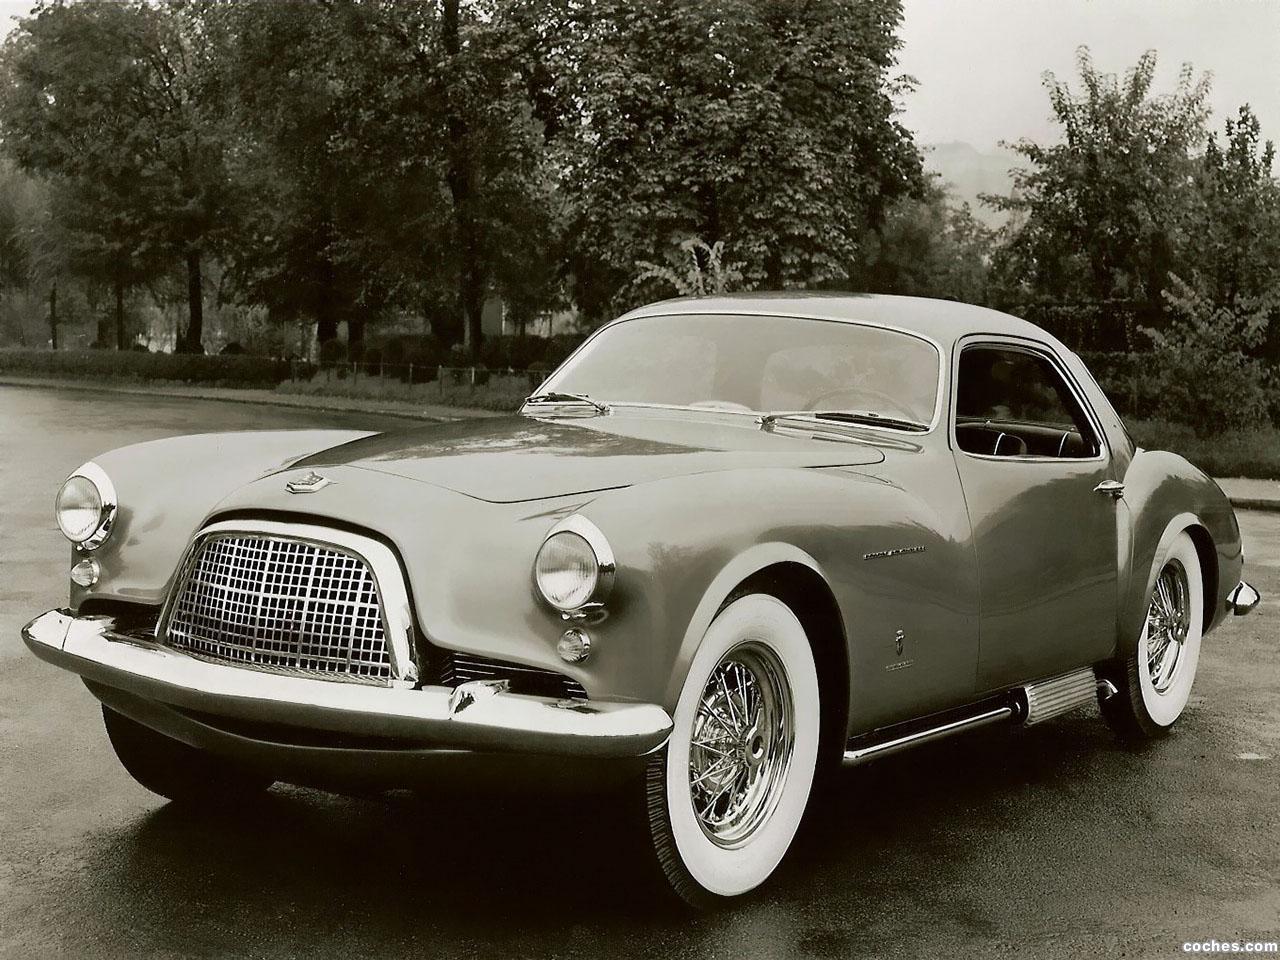 Foto 0 de DeSoto Adventurer Concept Car 1954